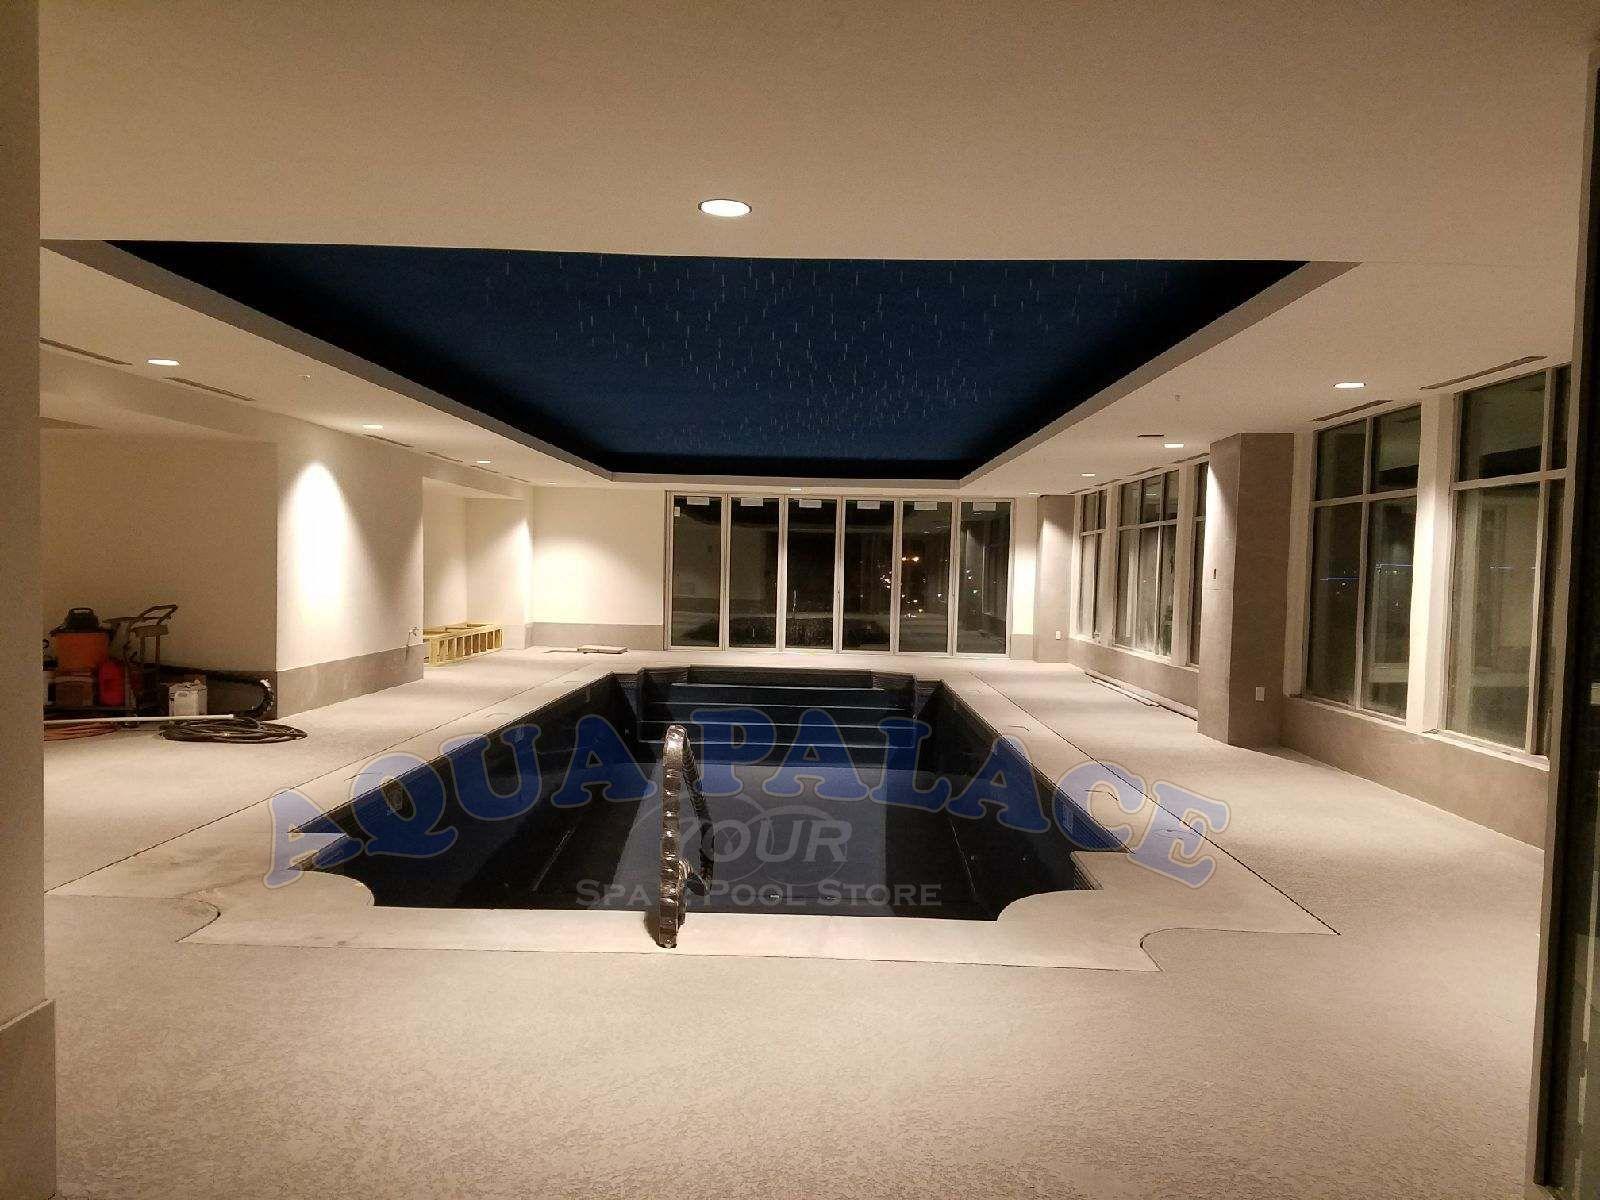 Atlas Apartments In Downtown Omaha Ne Fiberglass Pool On 8th Floor 16 X 44 Pool With Dual Staircases Custom W Pool Builders Building A Pool Pool Designs